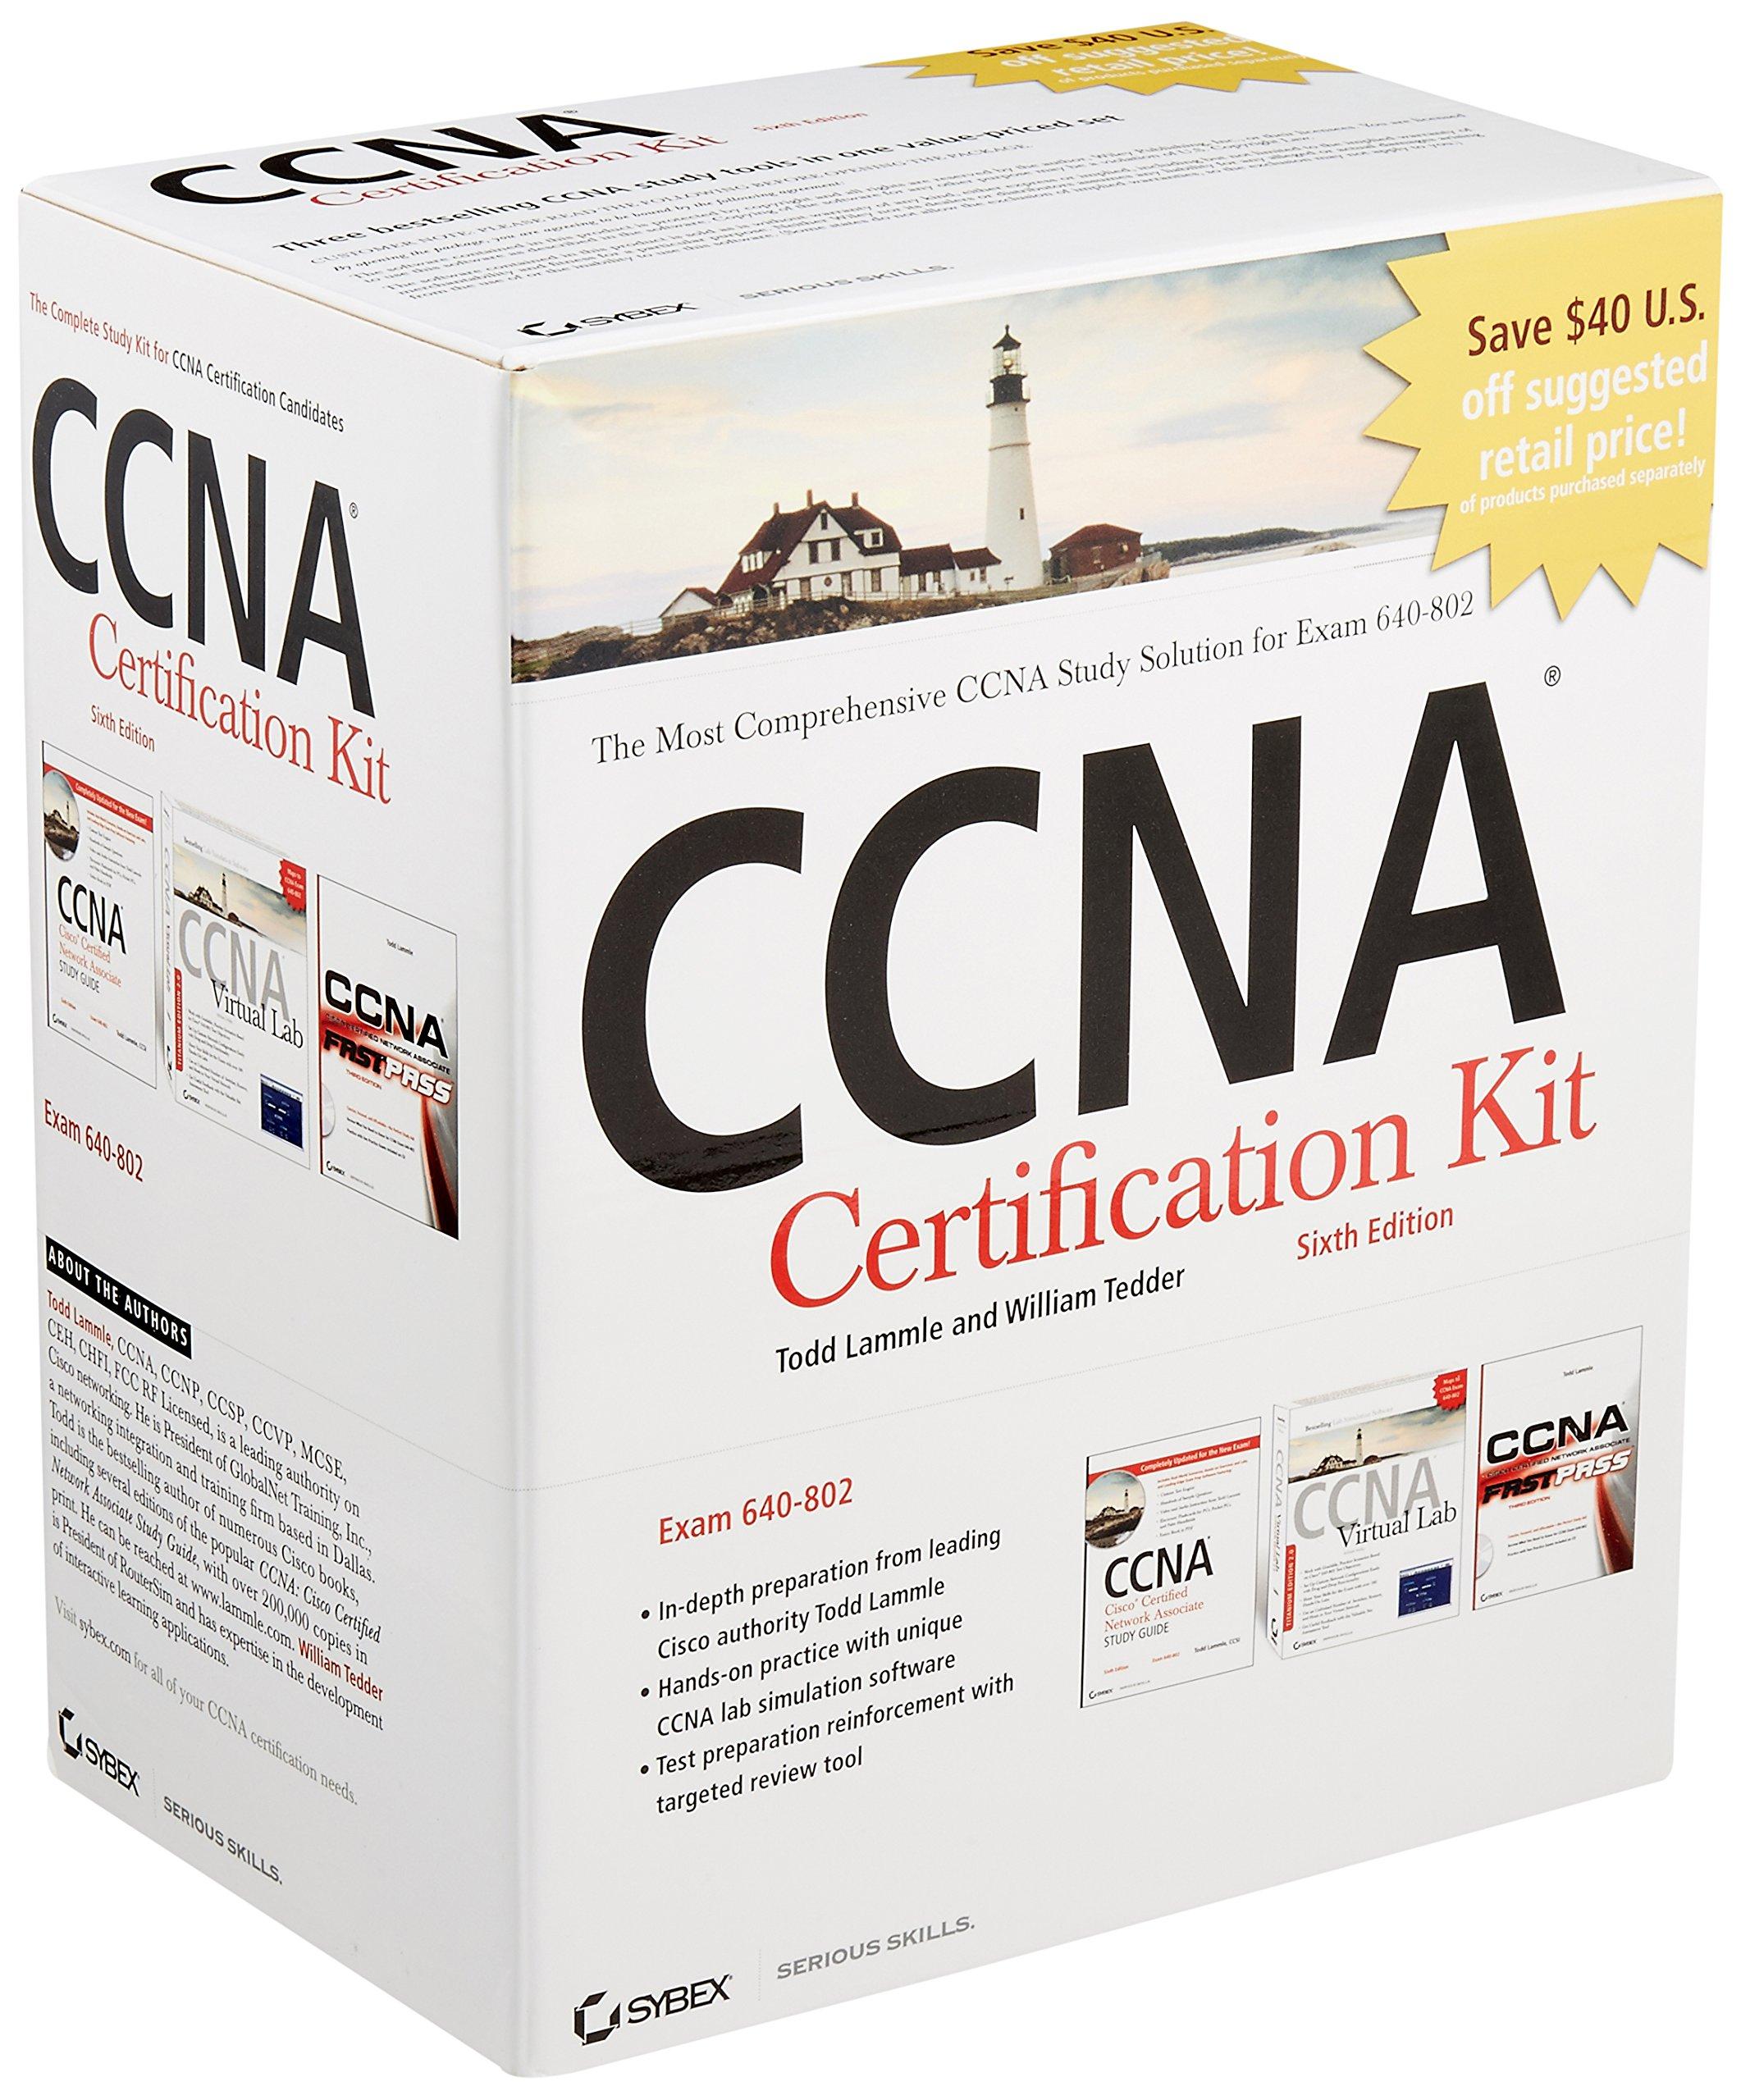 Ccna certification kit exam 640 802 amazon todd lammle ccna certification kit exam 640 802 amazon todd lammle william tedder 9780470447253 books 1betcityfo Gallery